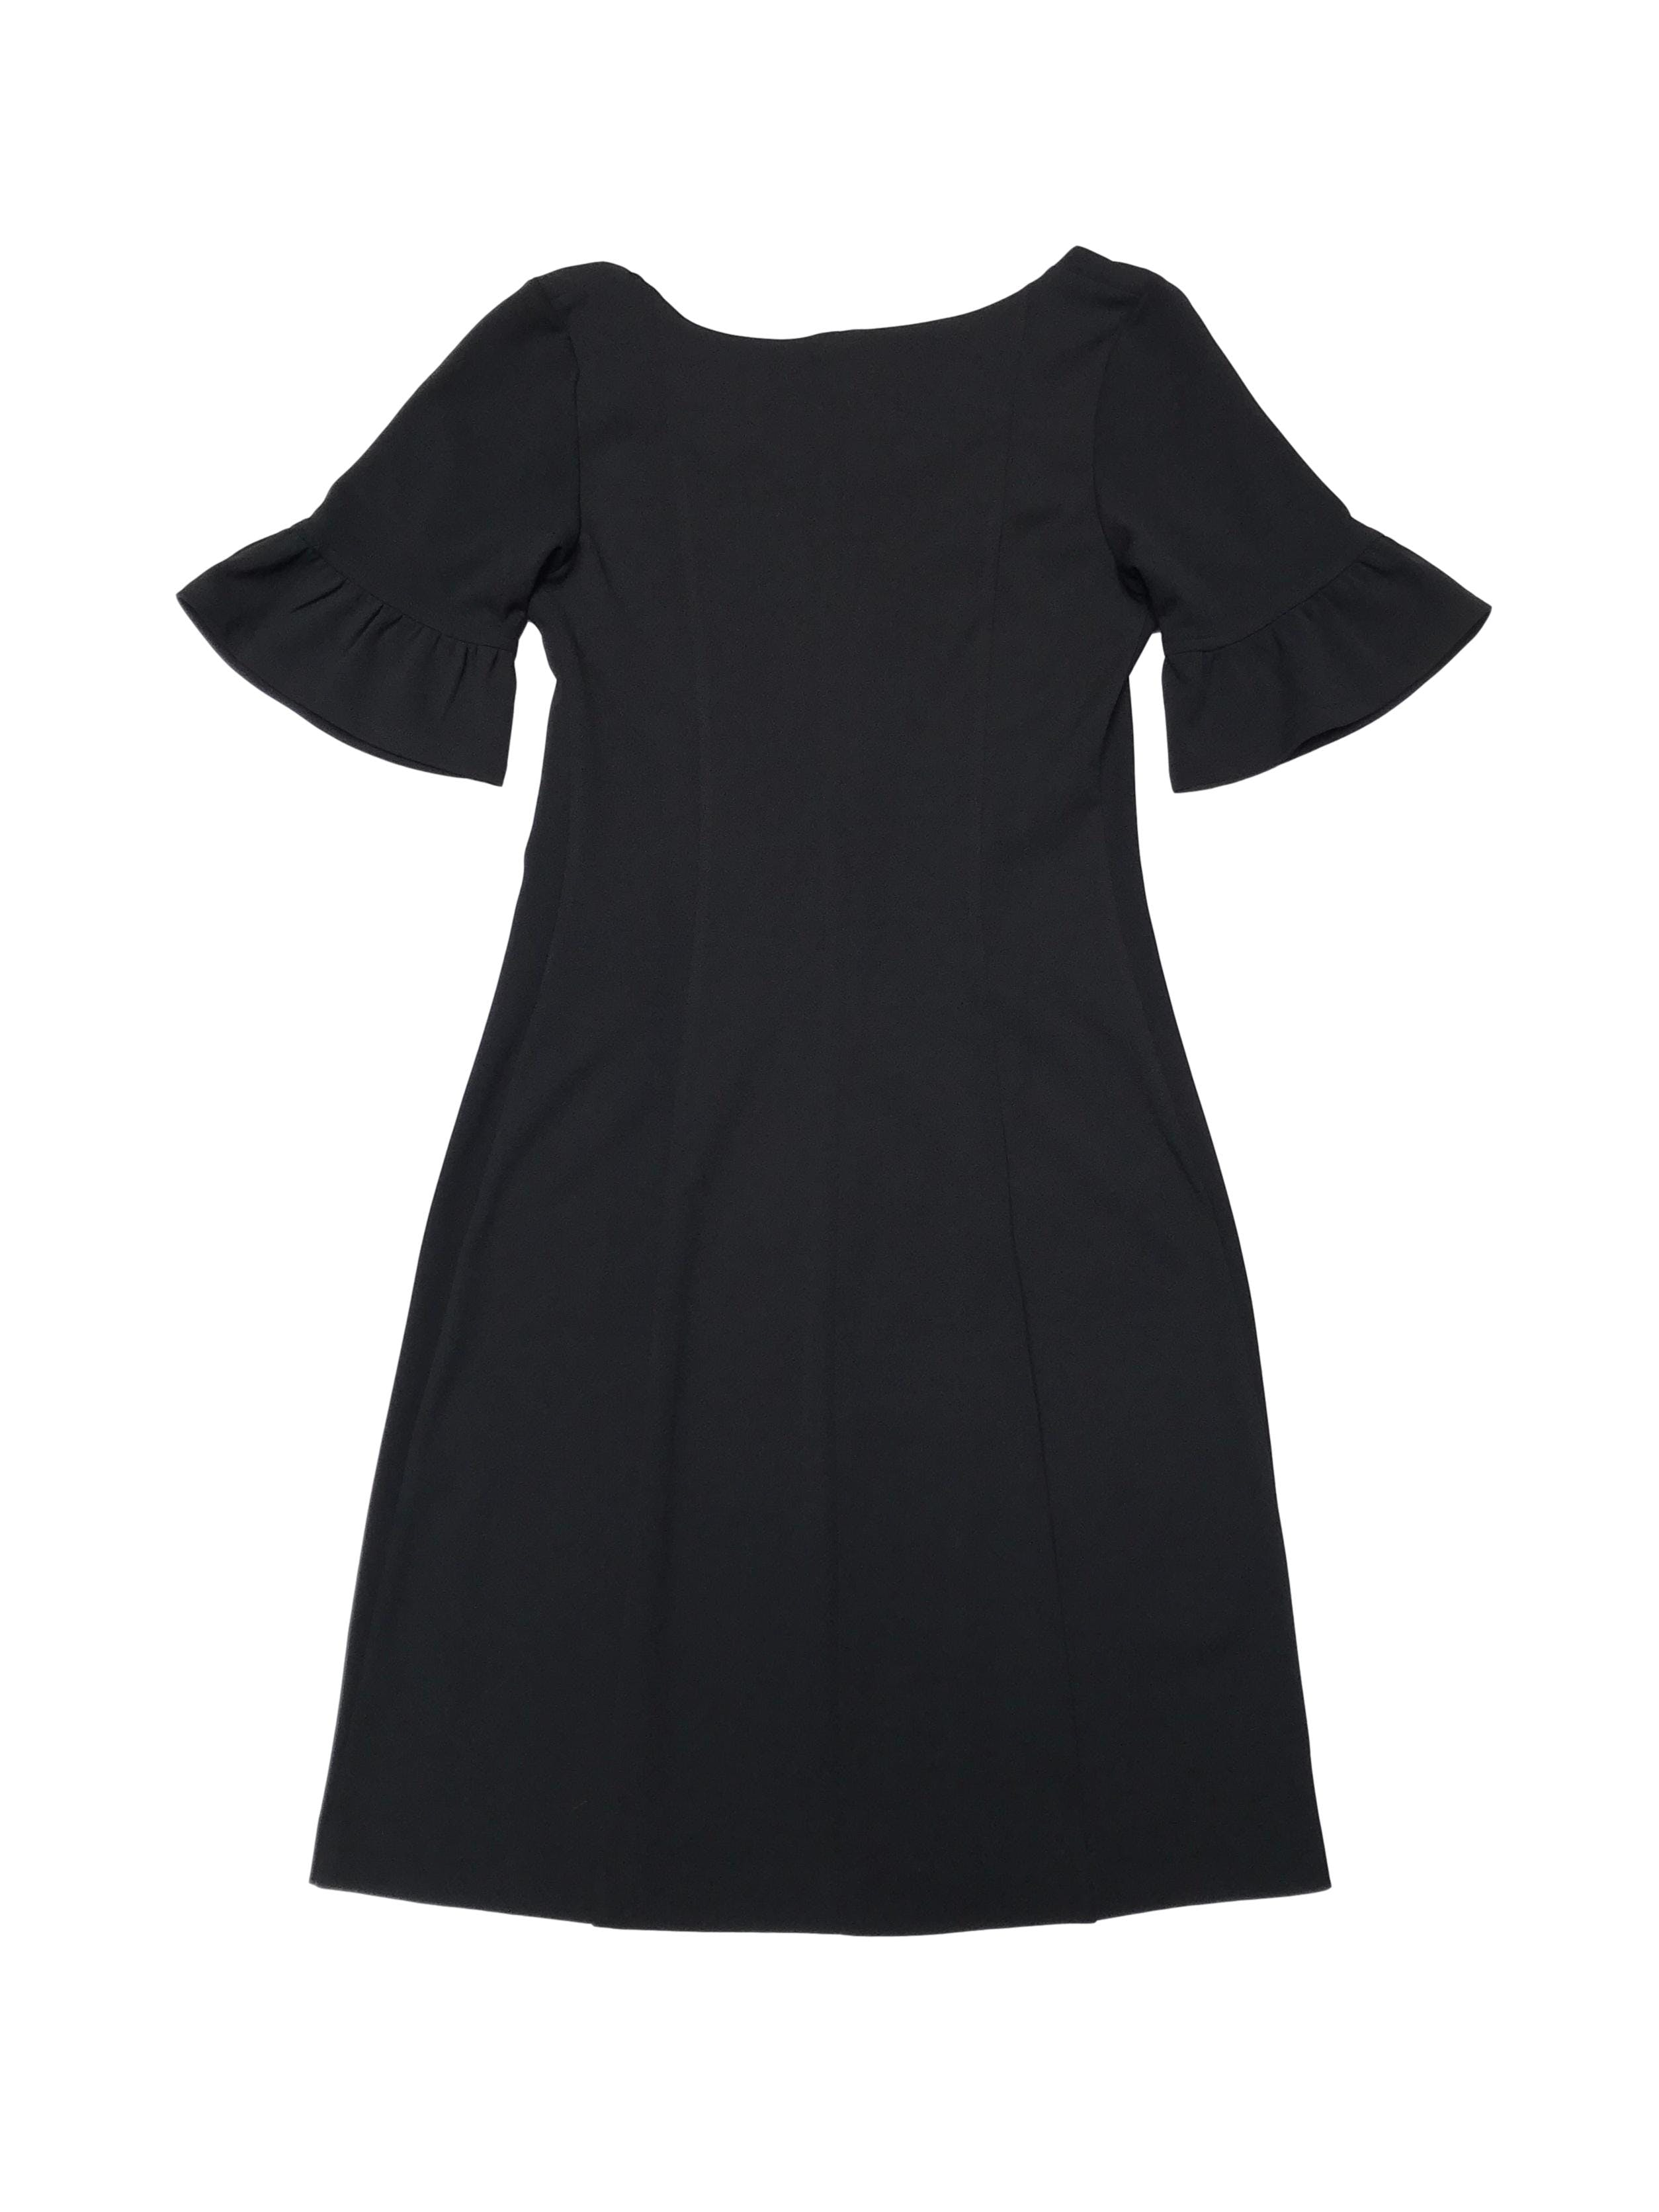 Vestido Moda&Cia negro ligeramente stretch, manga corta con bobitos. Busto 84cm (sin estirar) Cintura 68cm (sin estirar) Largo 88cm. Precio original S/ 280